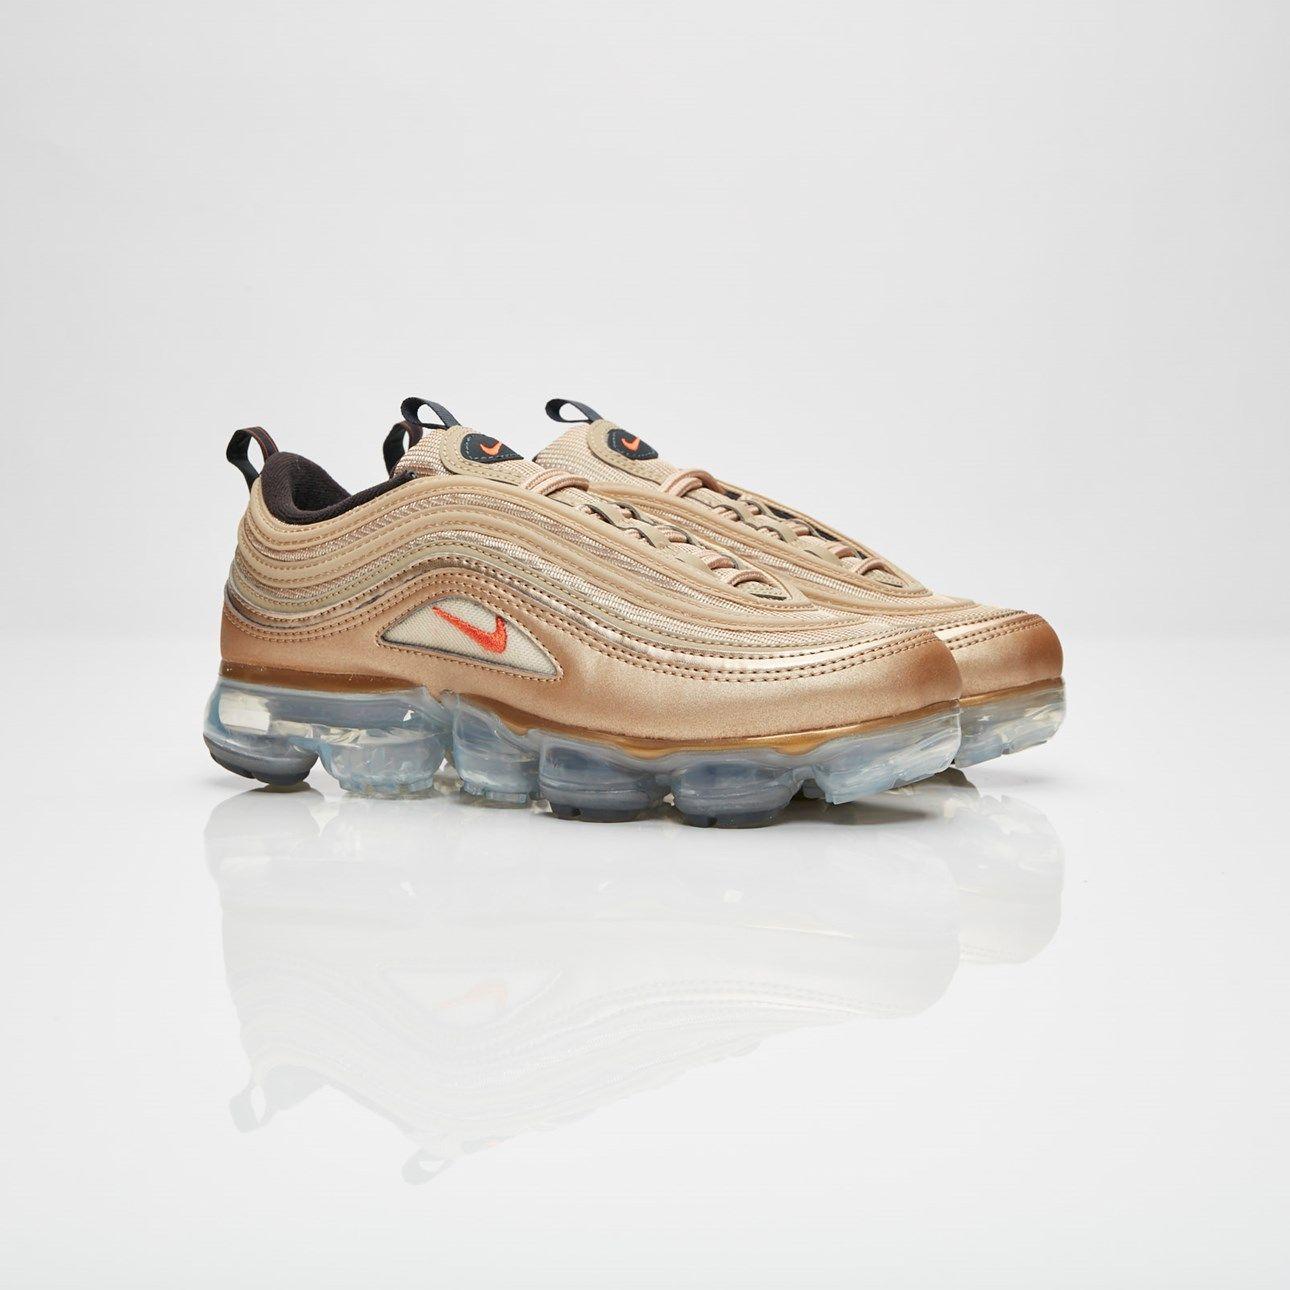 half off 45405 741c4 Nike Wmns Air Vapormax 97 - Ao4542-902 - Sneakersnstuff ...